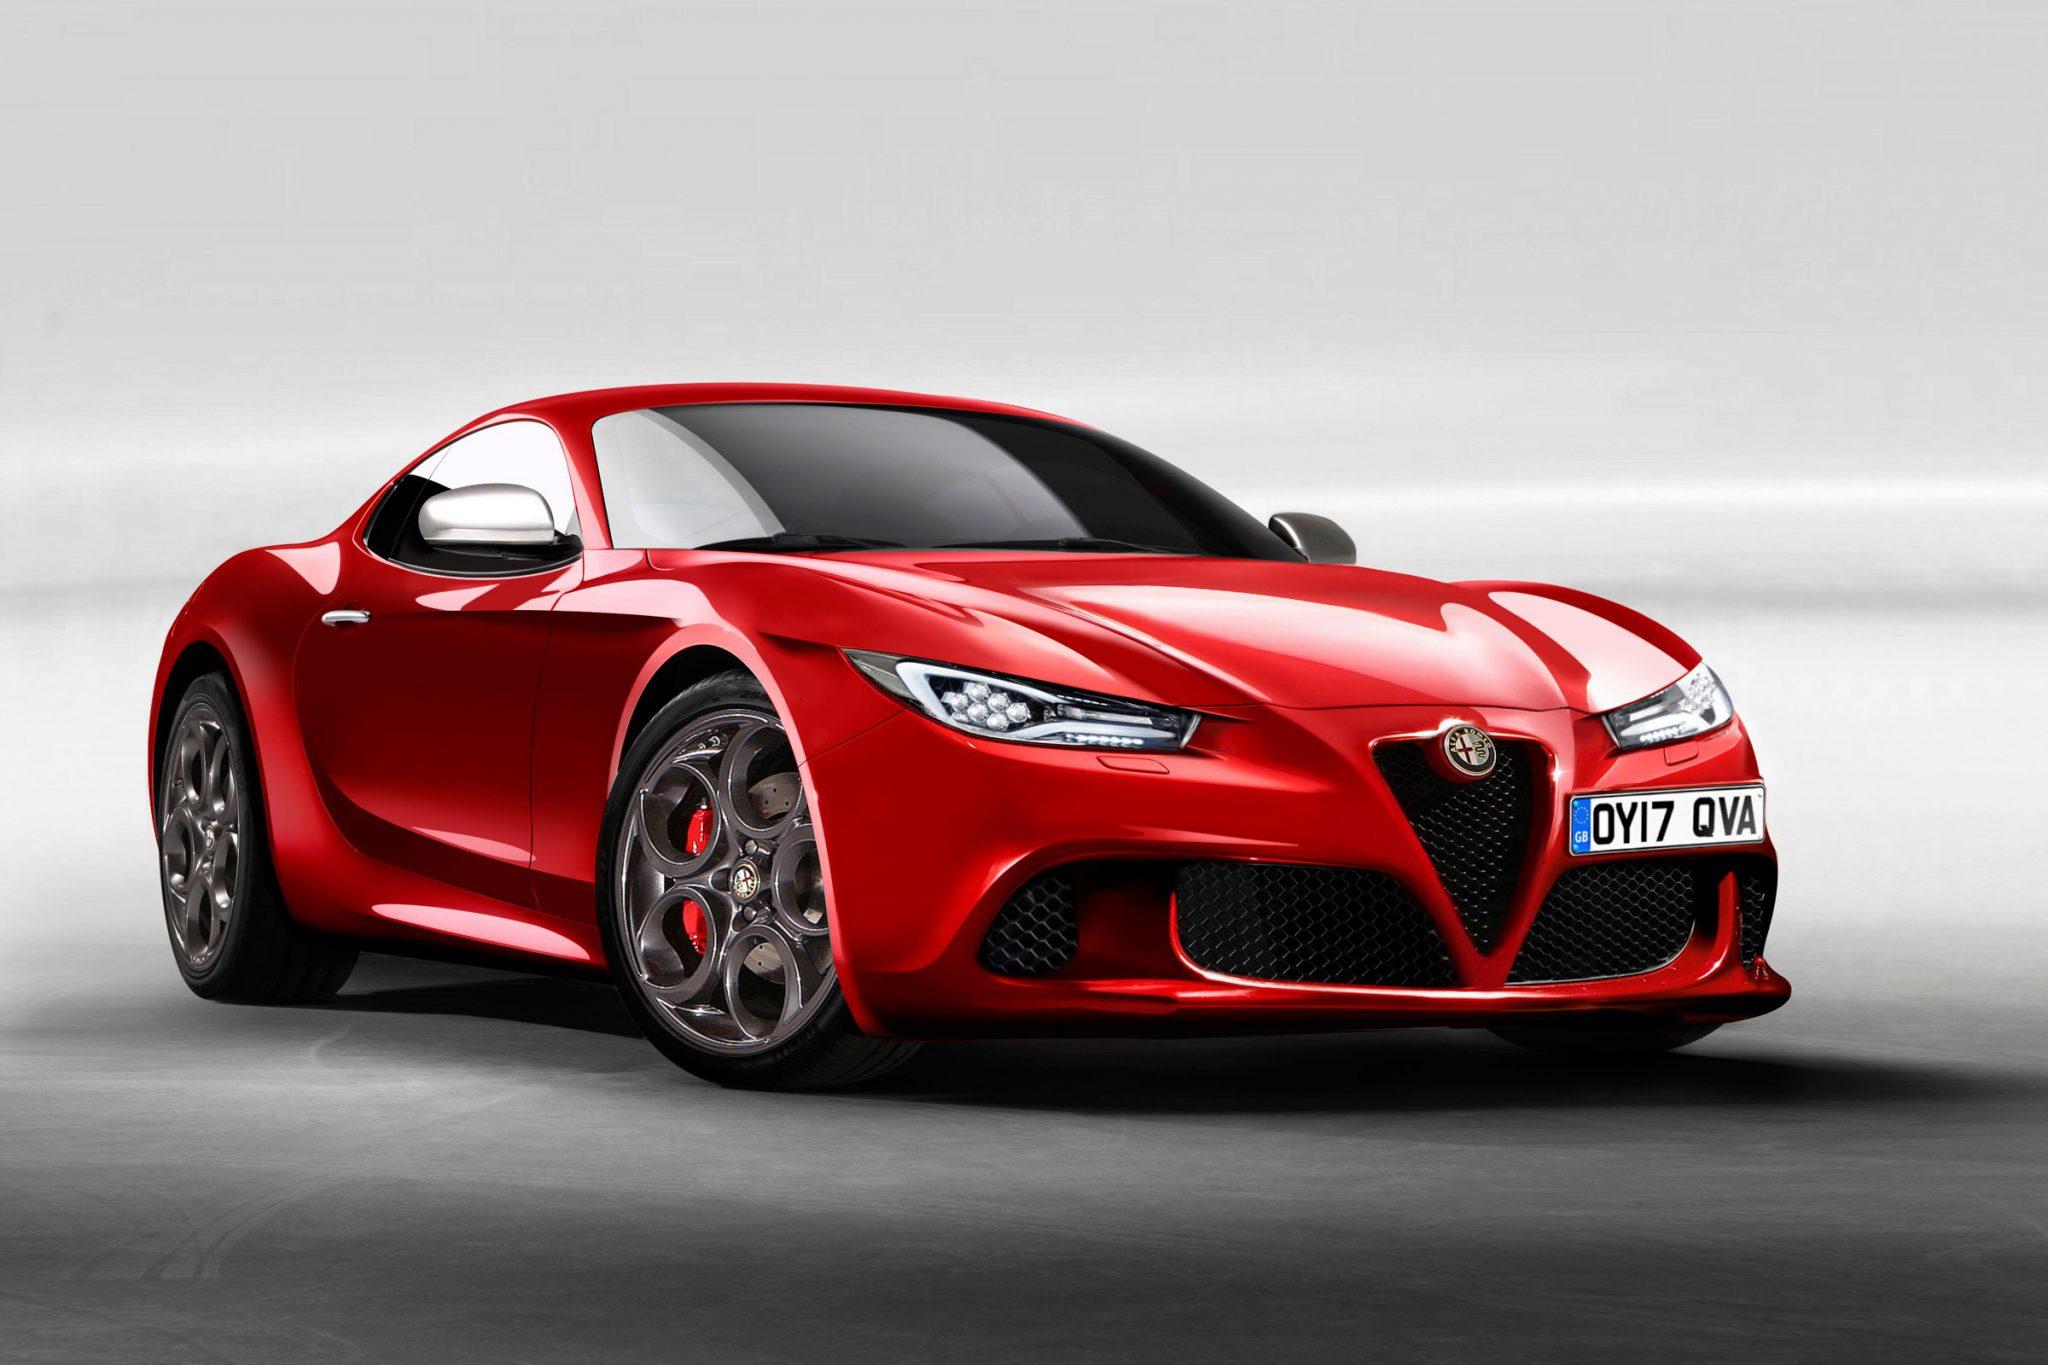 alfa romeo 6c fr 2 آلفا رومئو ۶C رونمایی شد   اجاره ماشین